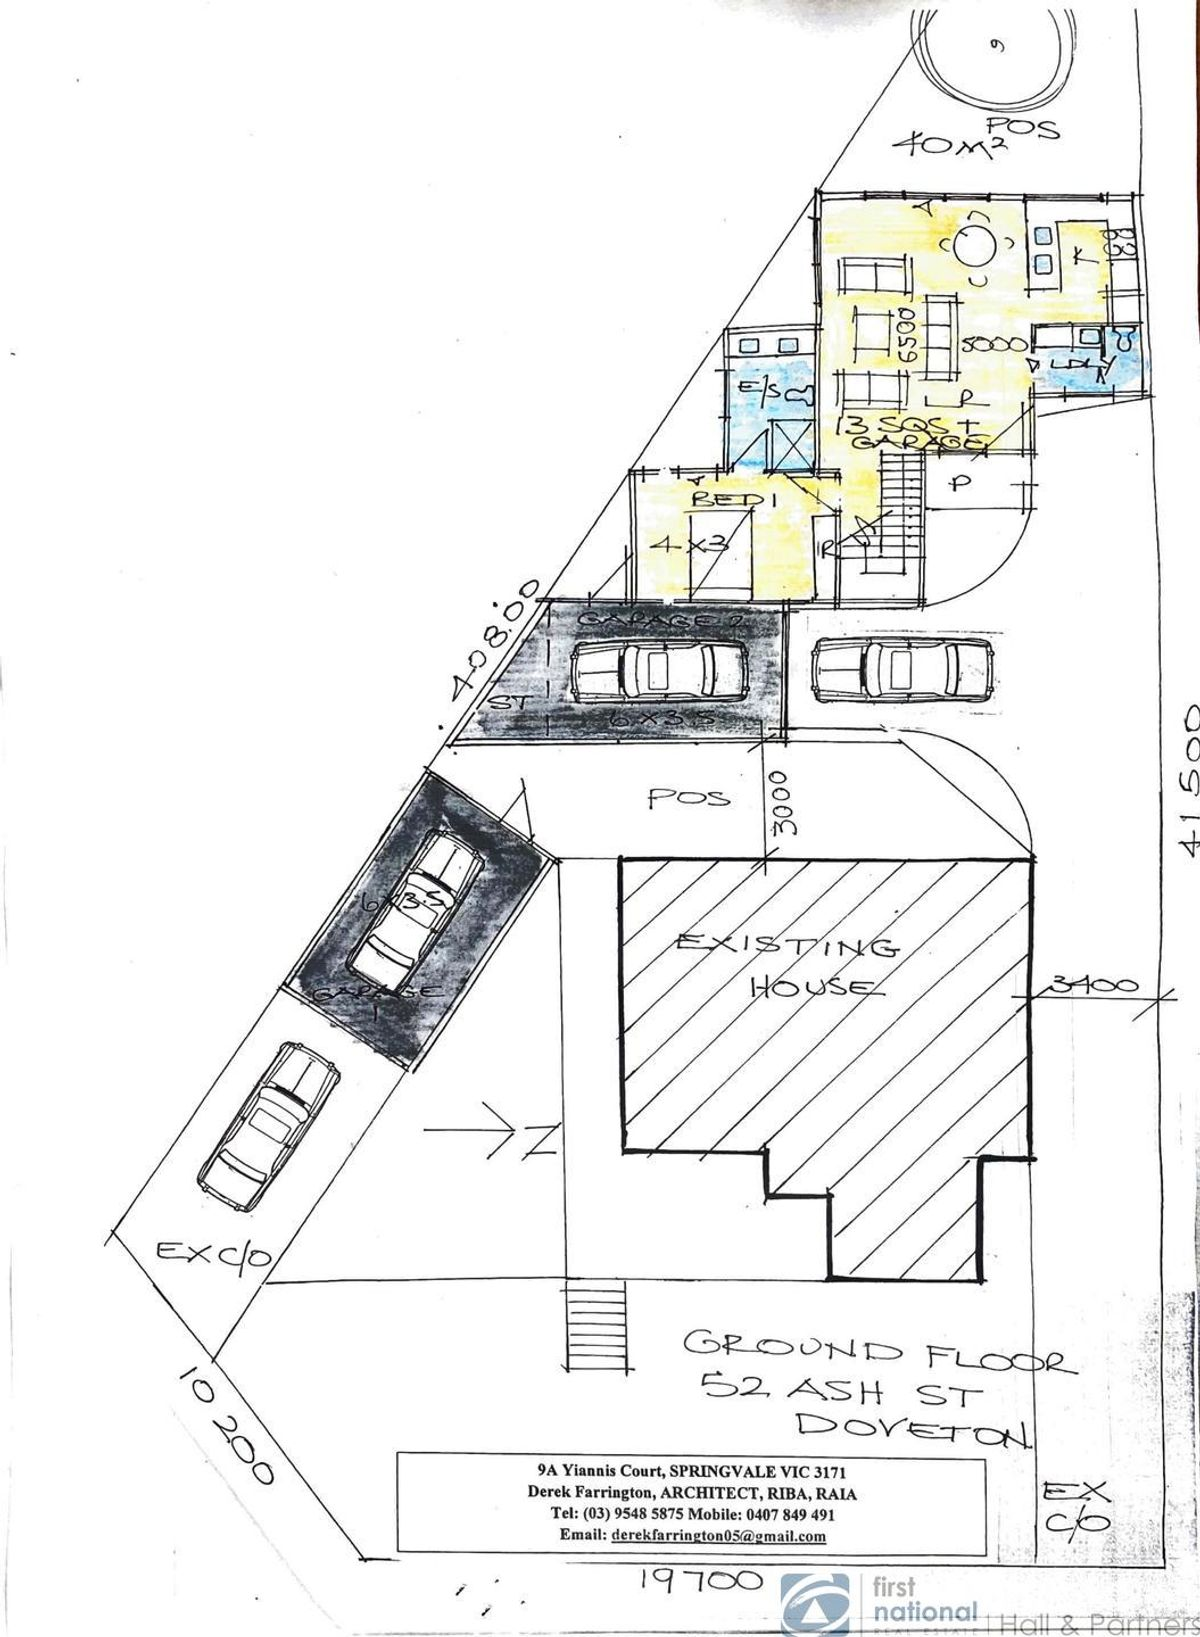 52 Ash Street, Doveton, VIC 3177